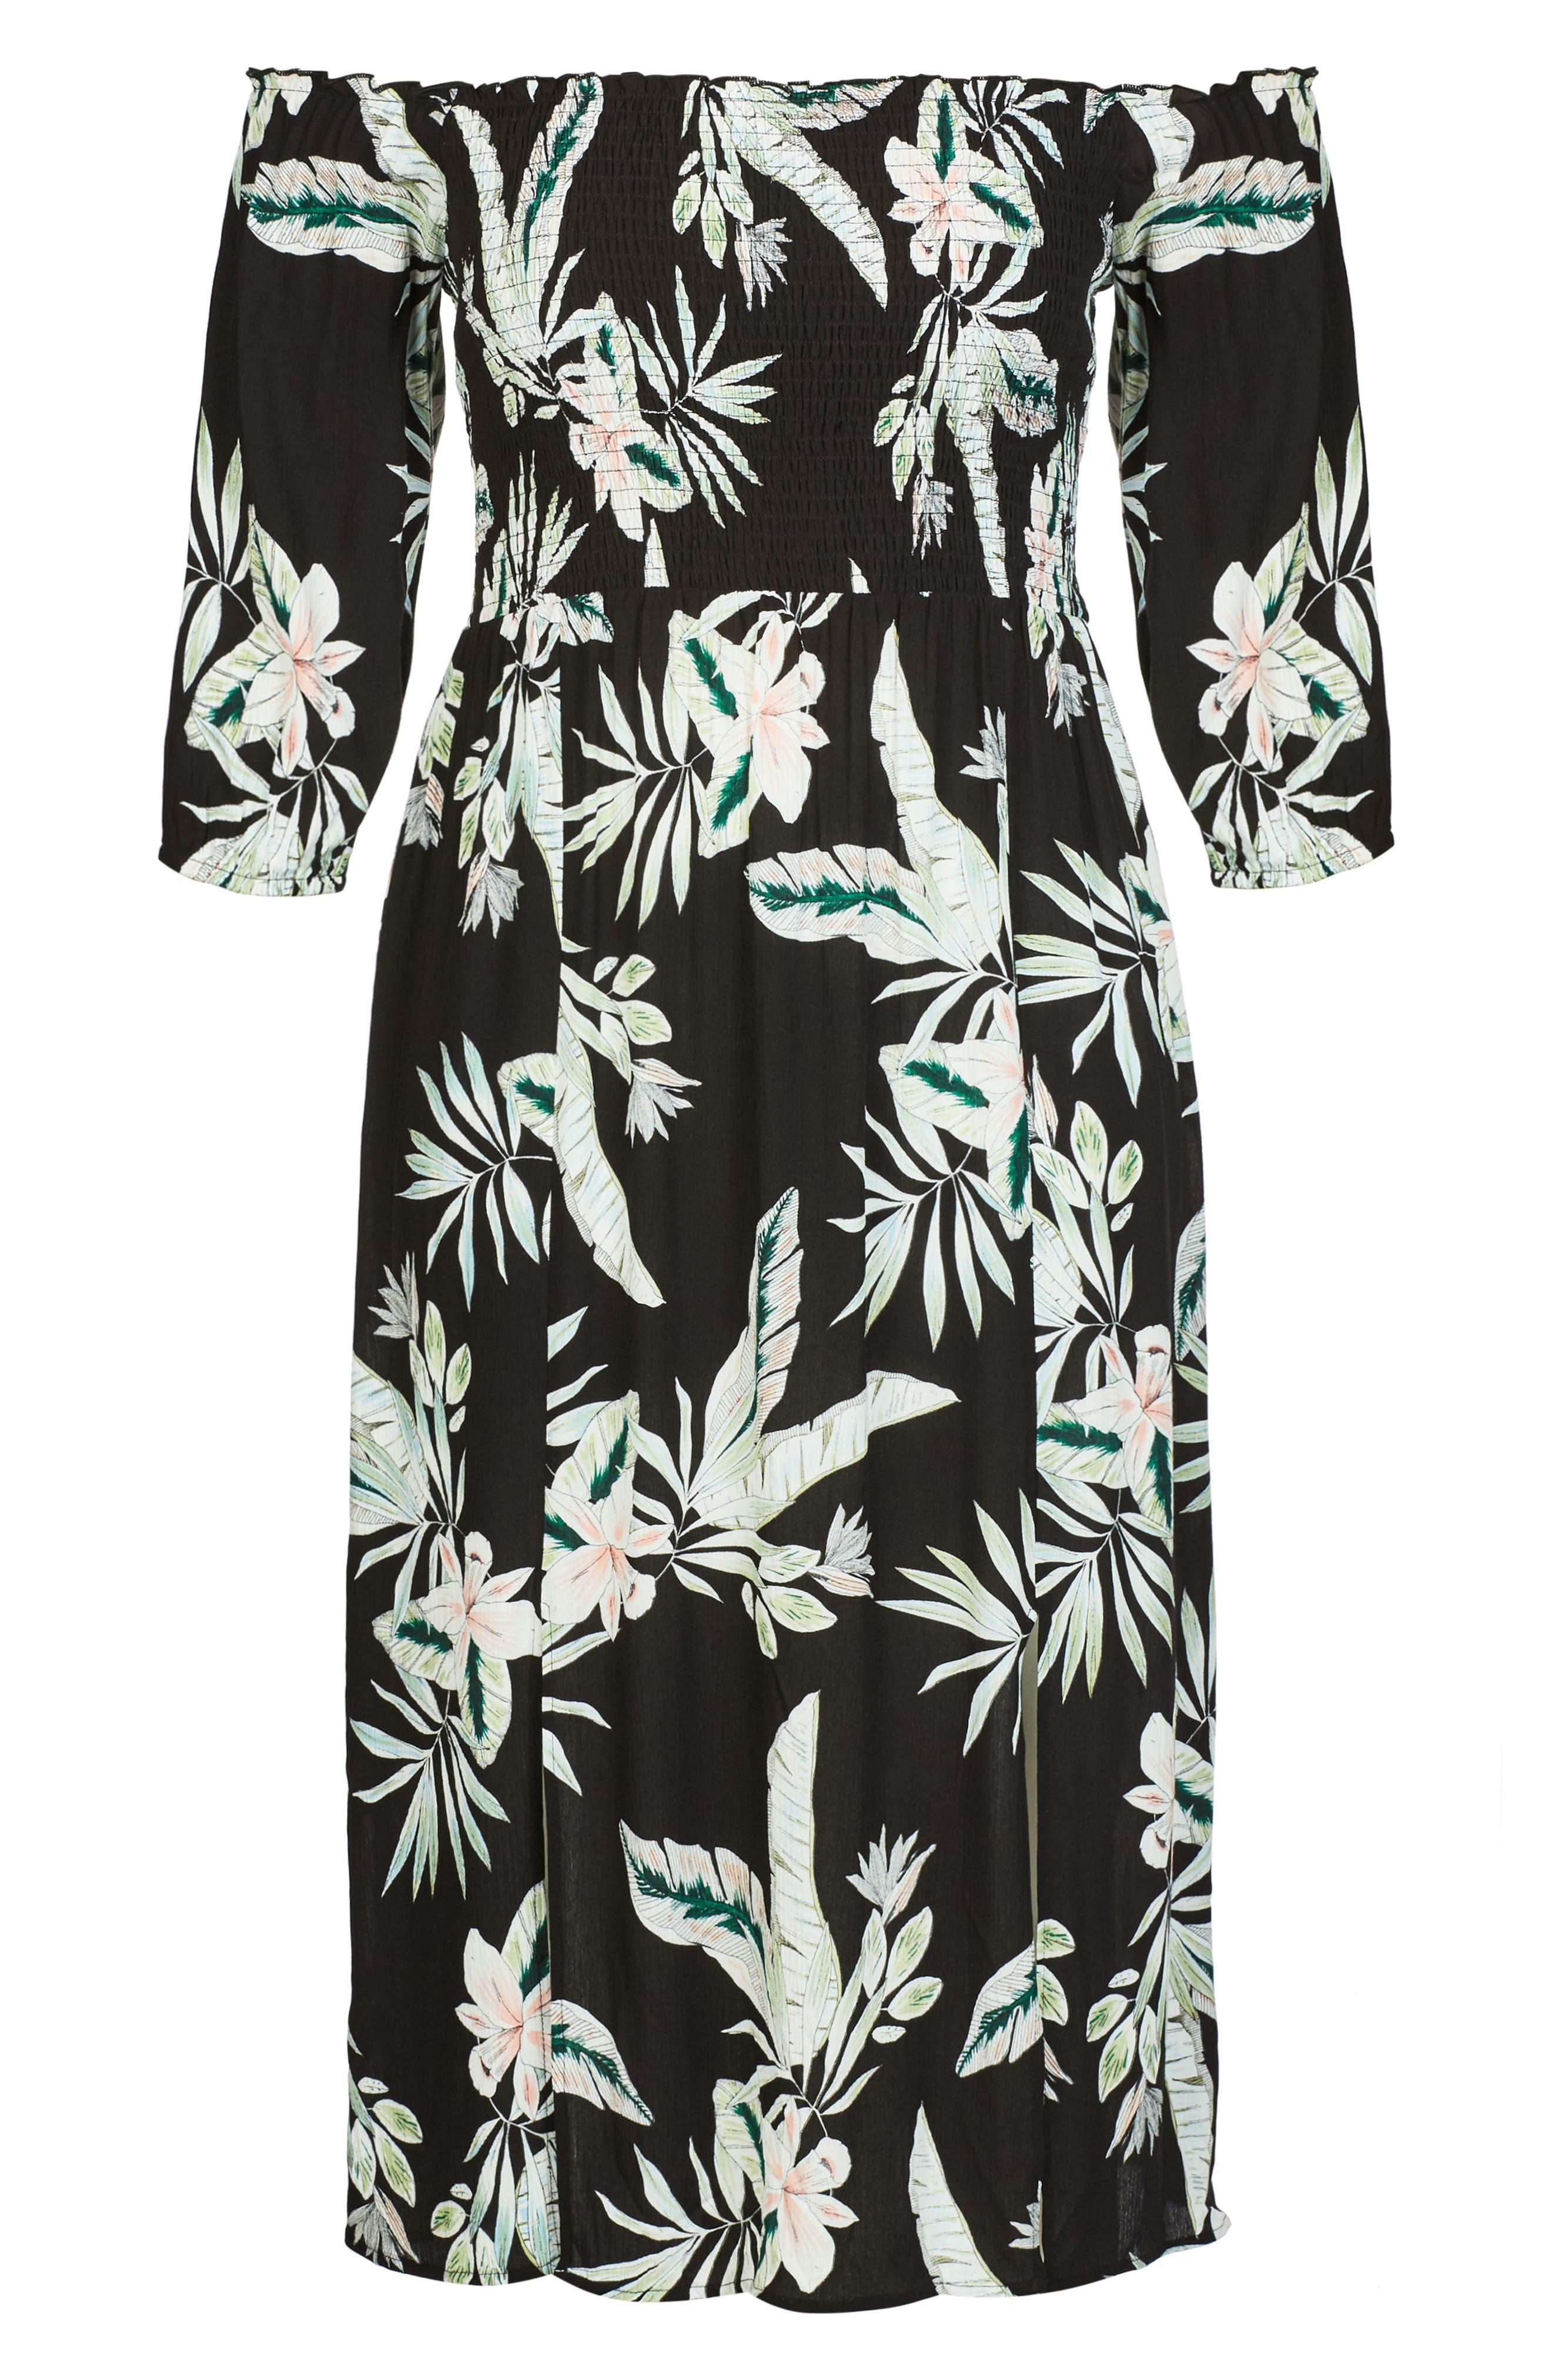 Oahu Off the Shoulder Midi Dress,                             Alternate thumbnail 3, color,                             OAHU ORCHID